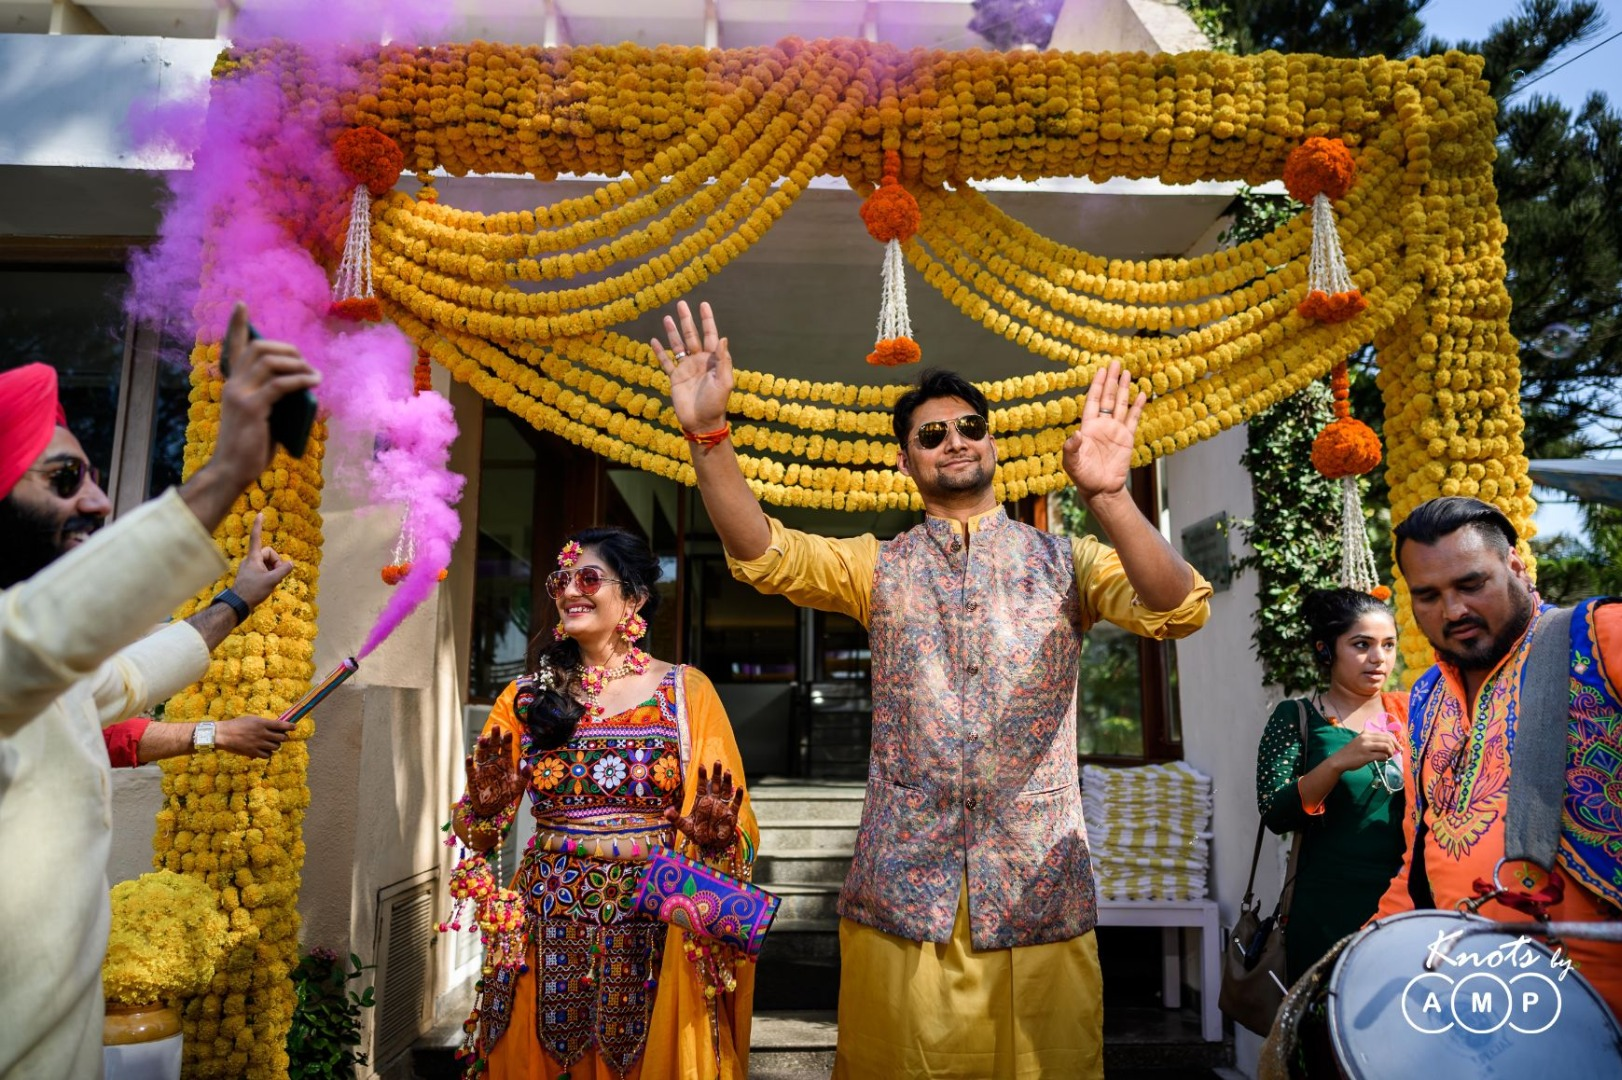 Bride Groom Dancing at Haldi Ceremony and all Marigold Decor